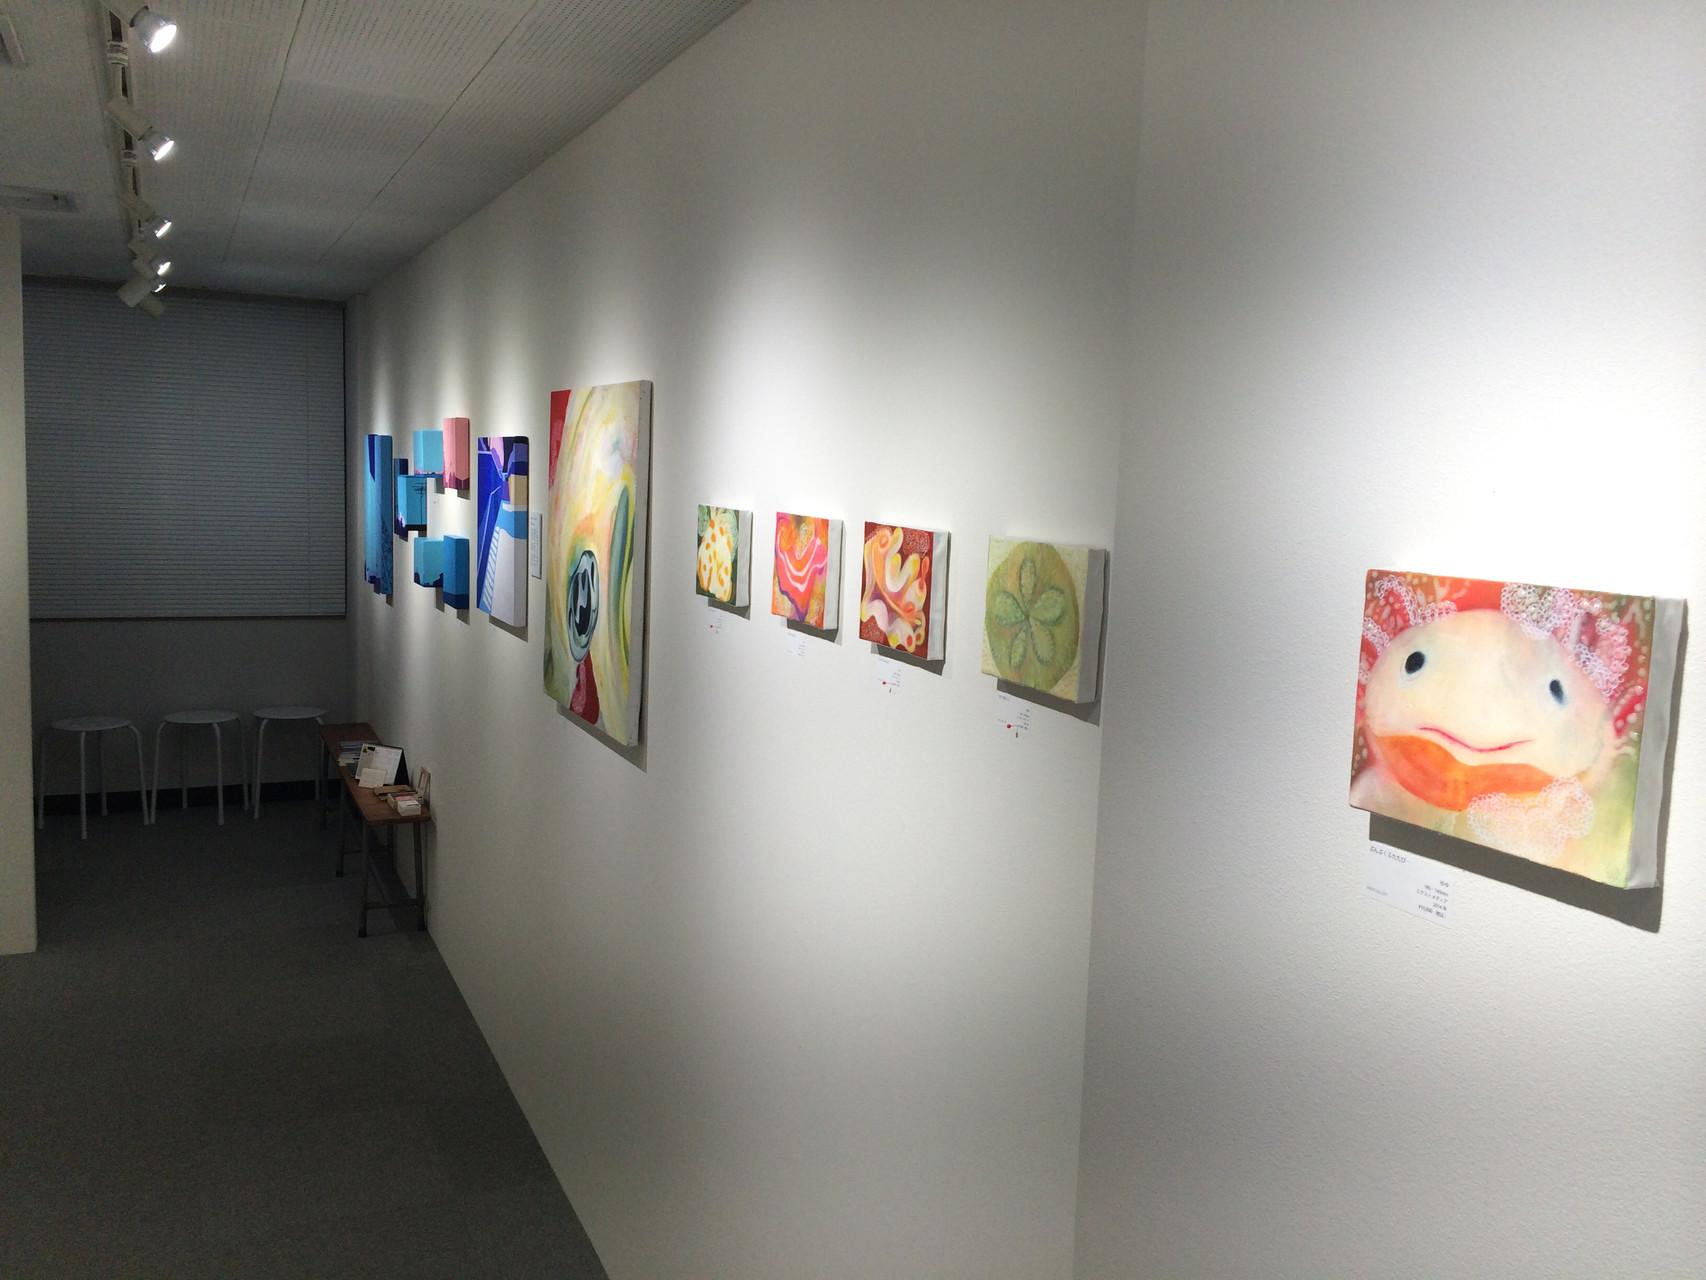 「ART SALON vol3」@JINEN GALLERY 2014.11.29-12.7